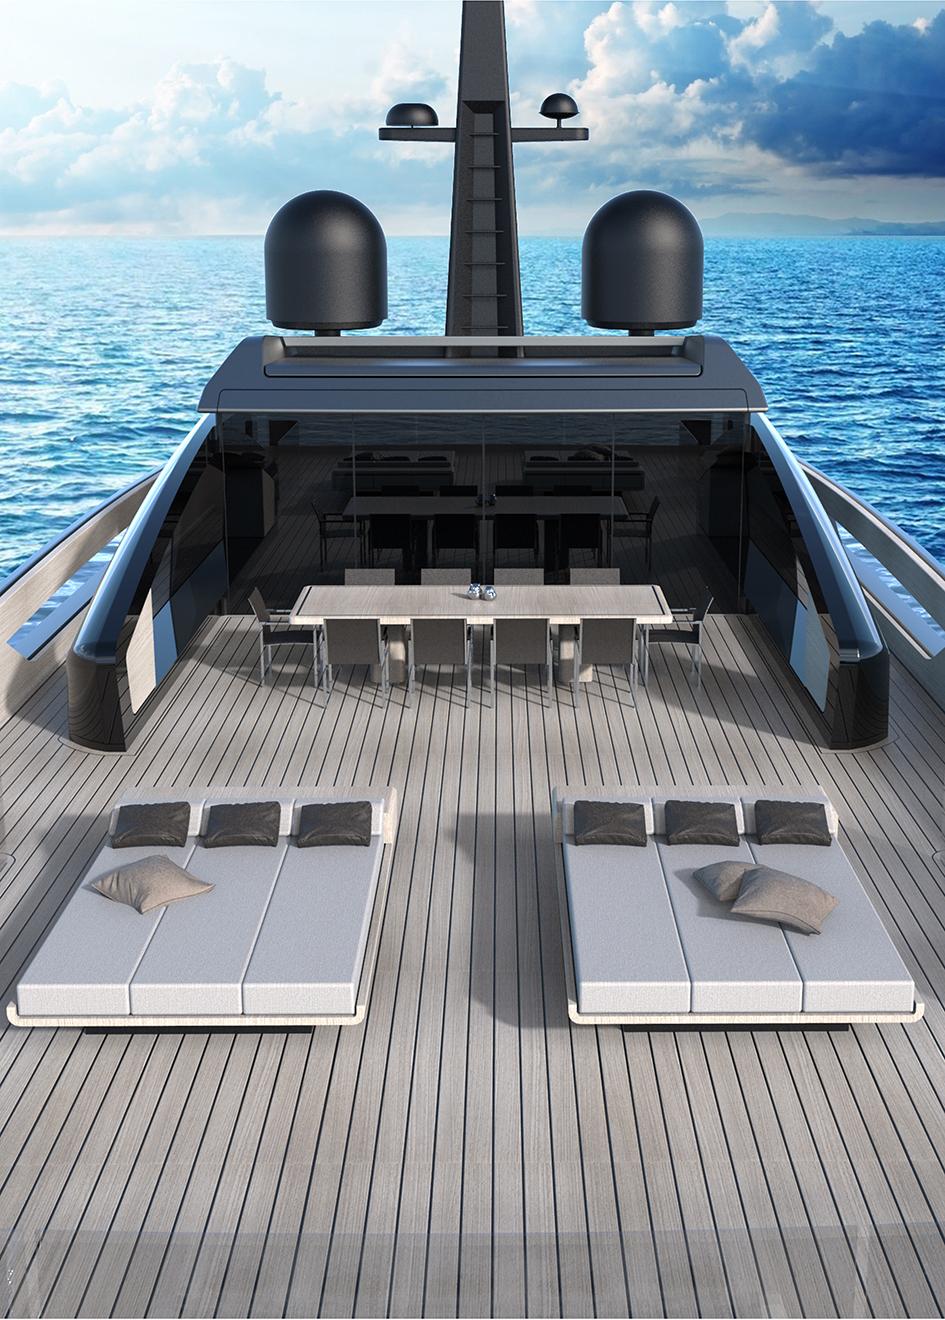 the-upper-deck-of-the-53-metre-tankoa-motor-yacht-saetta